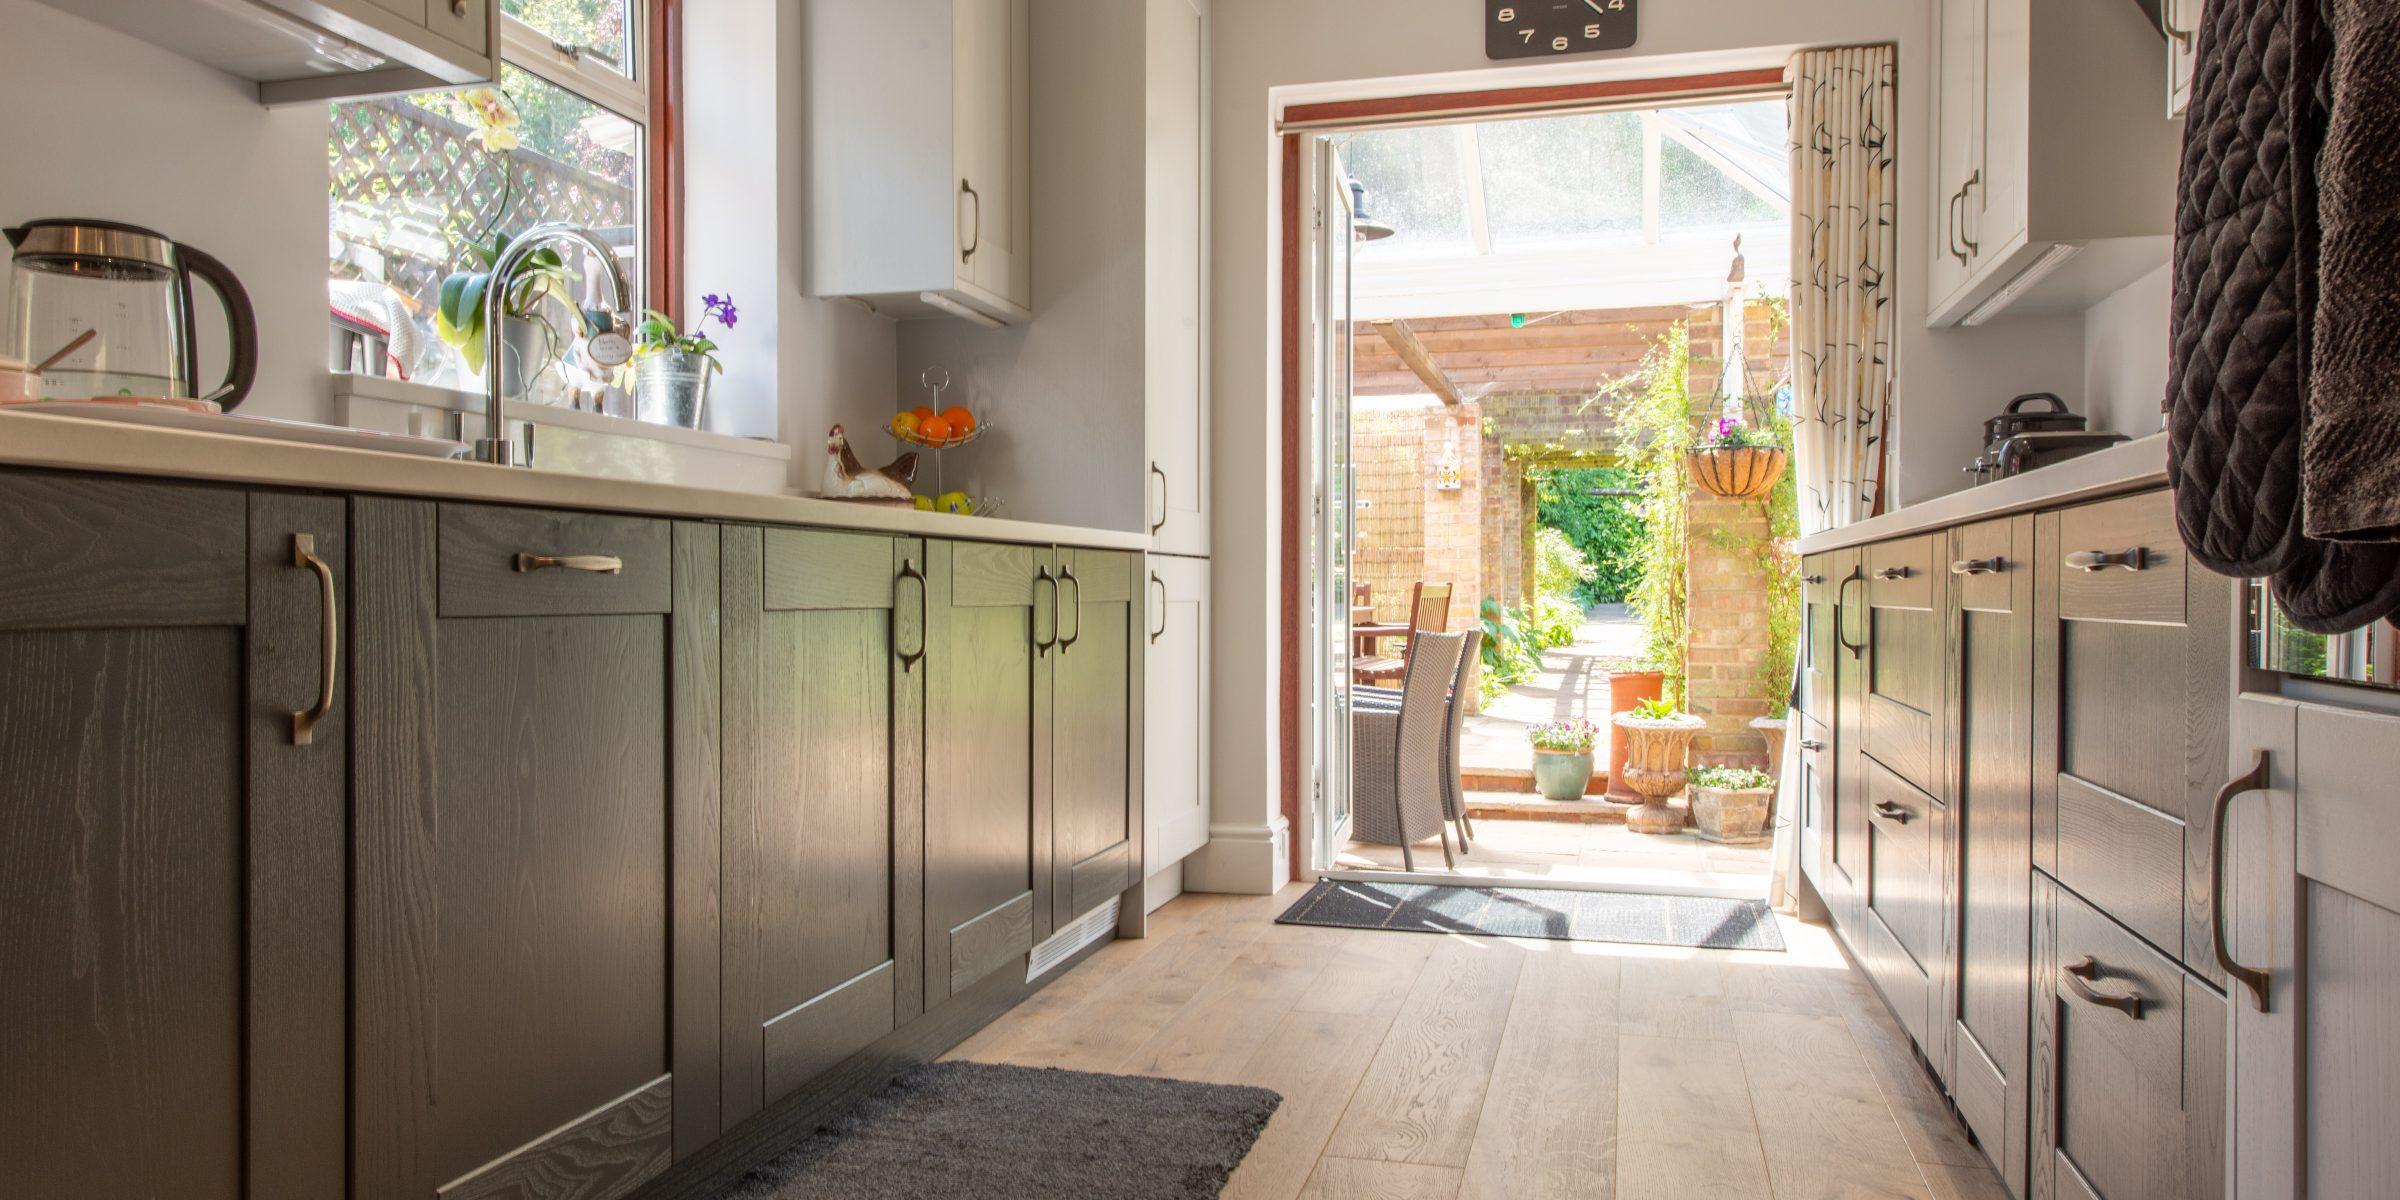 Deco frozen umber knaphill kitchen 5